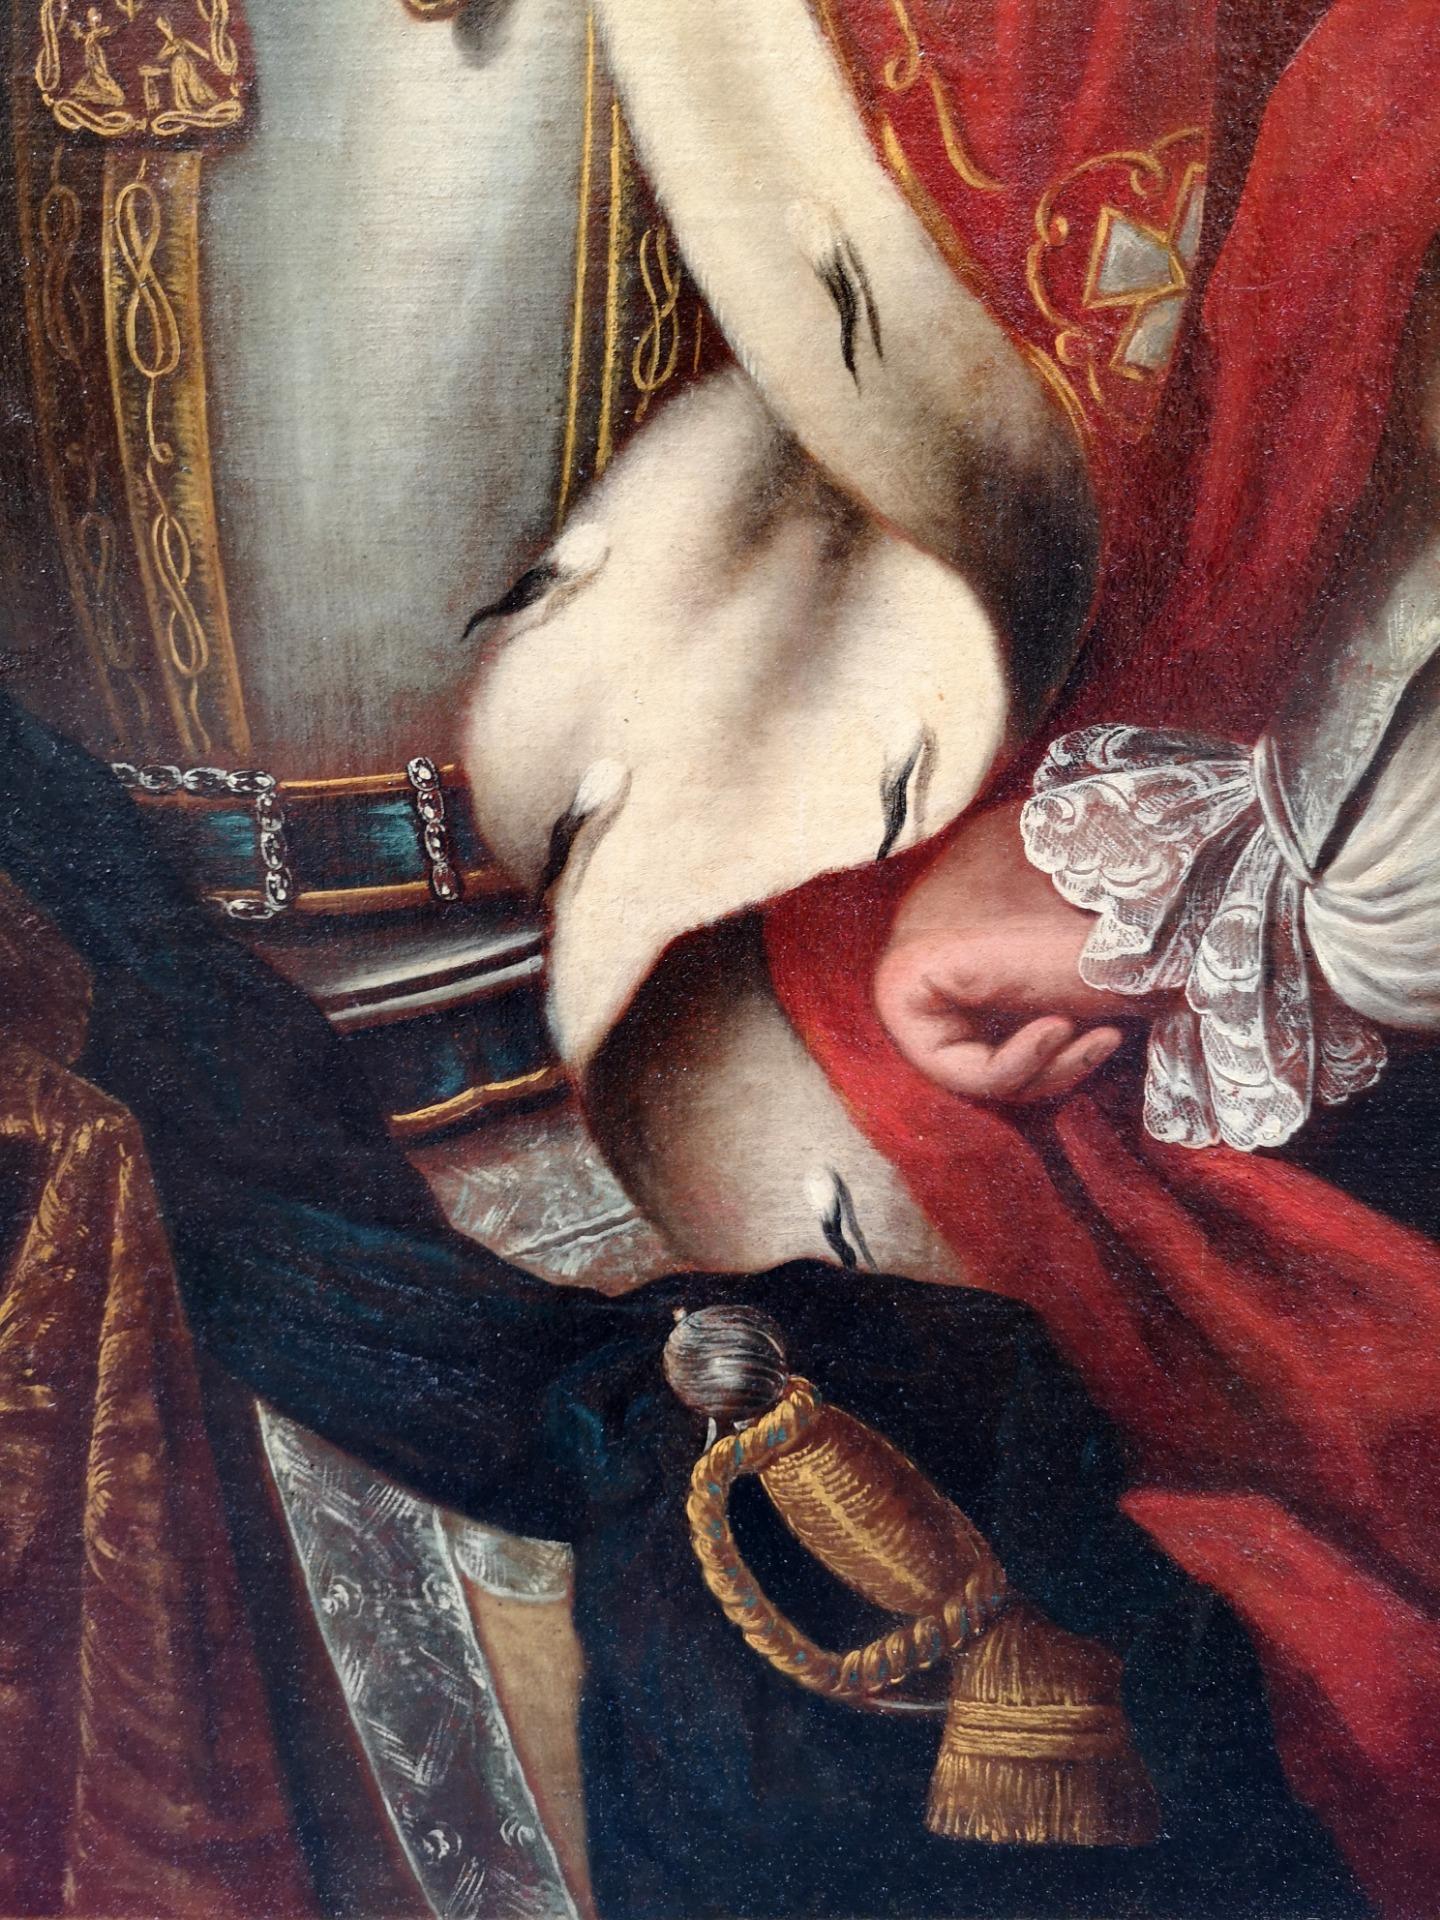 thumb3|Dipinto olio su tela , raffigurante Carlo Emanuele III di Savoia: epoca: metà 700